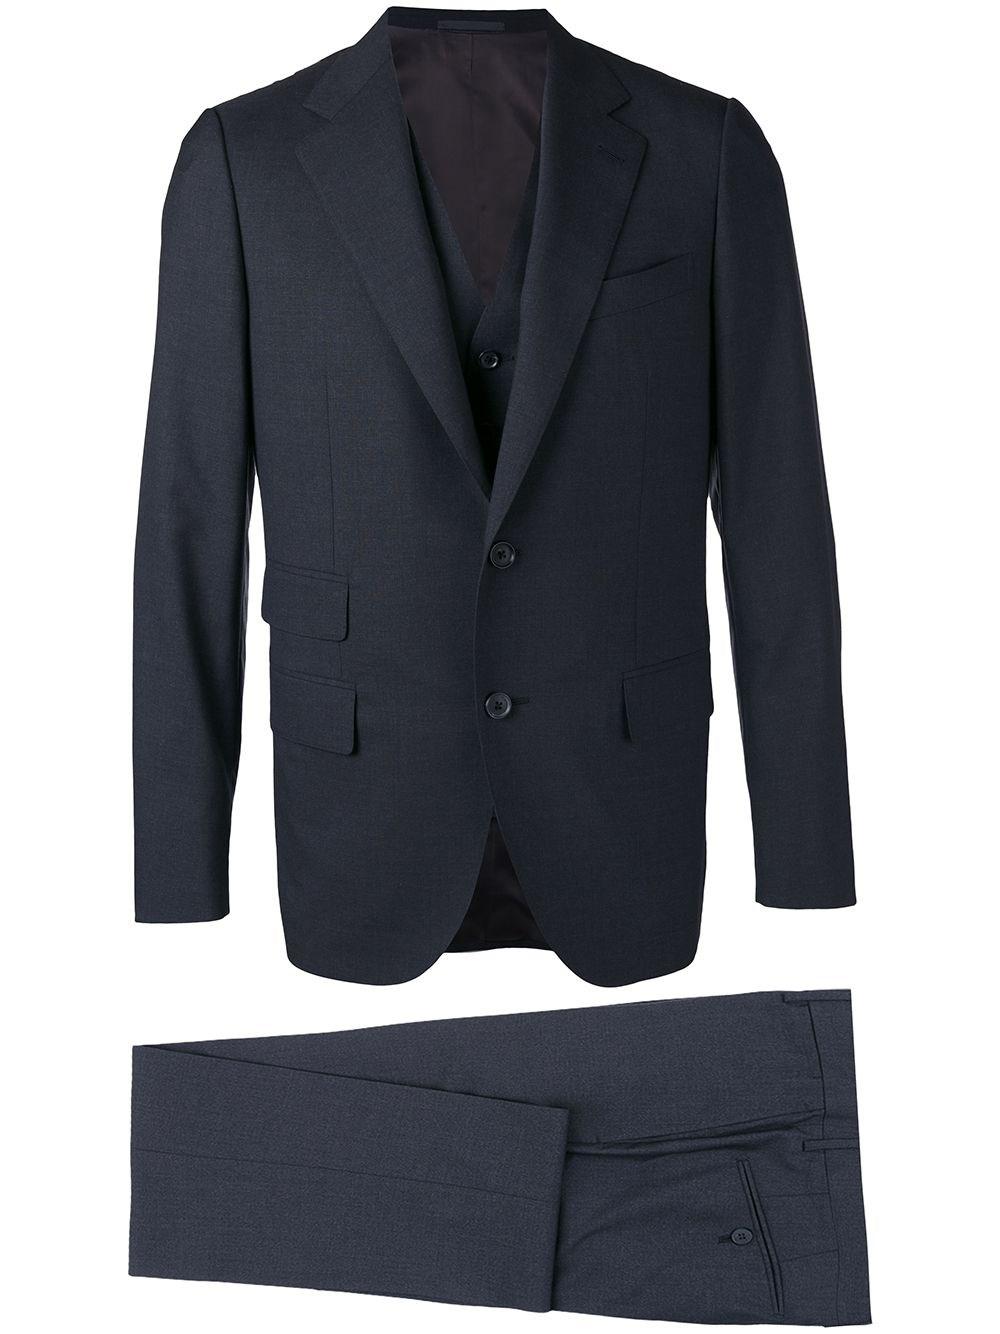 CARUSO Two-Piece Suit & Gilet